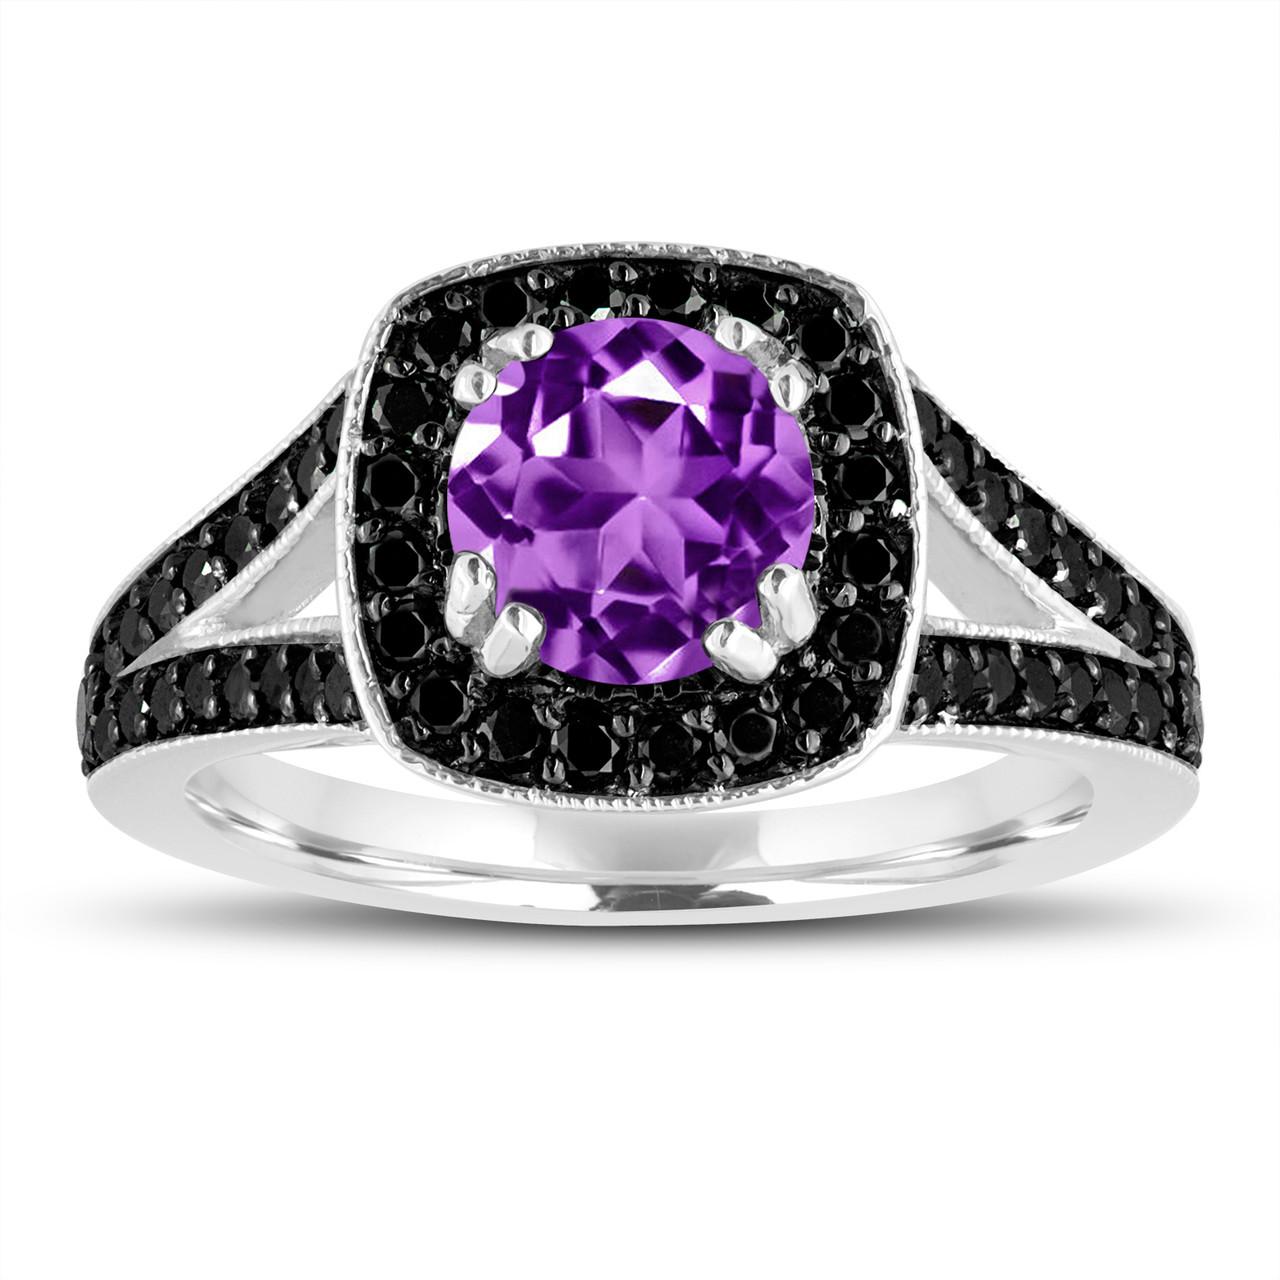 Red Garnet Engagement Ring 14k Black Gold Vintage Style 1 76 Carat Halo Pave Handmade